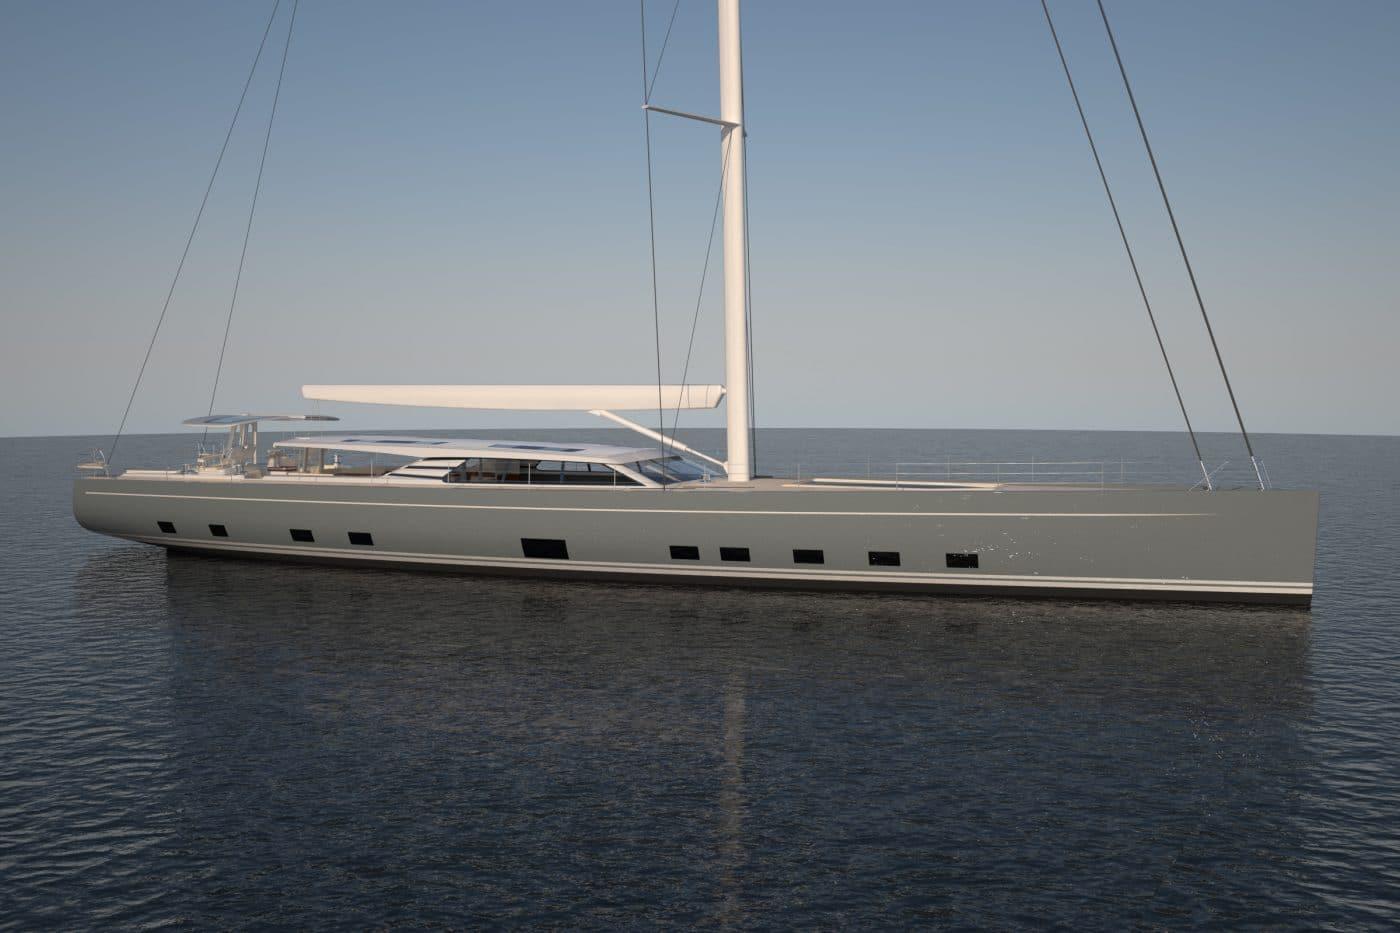 Baltic 146 Yacht